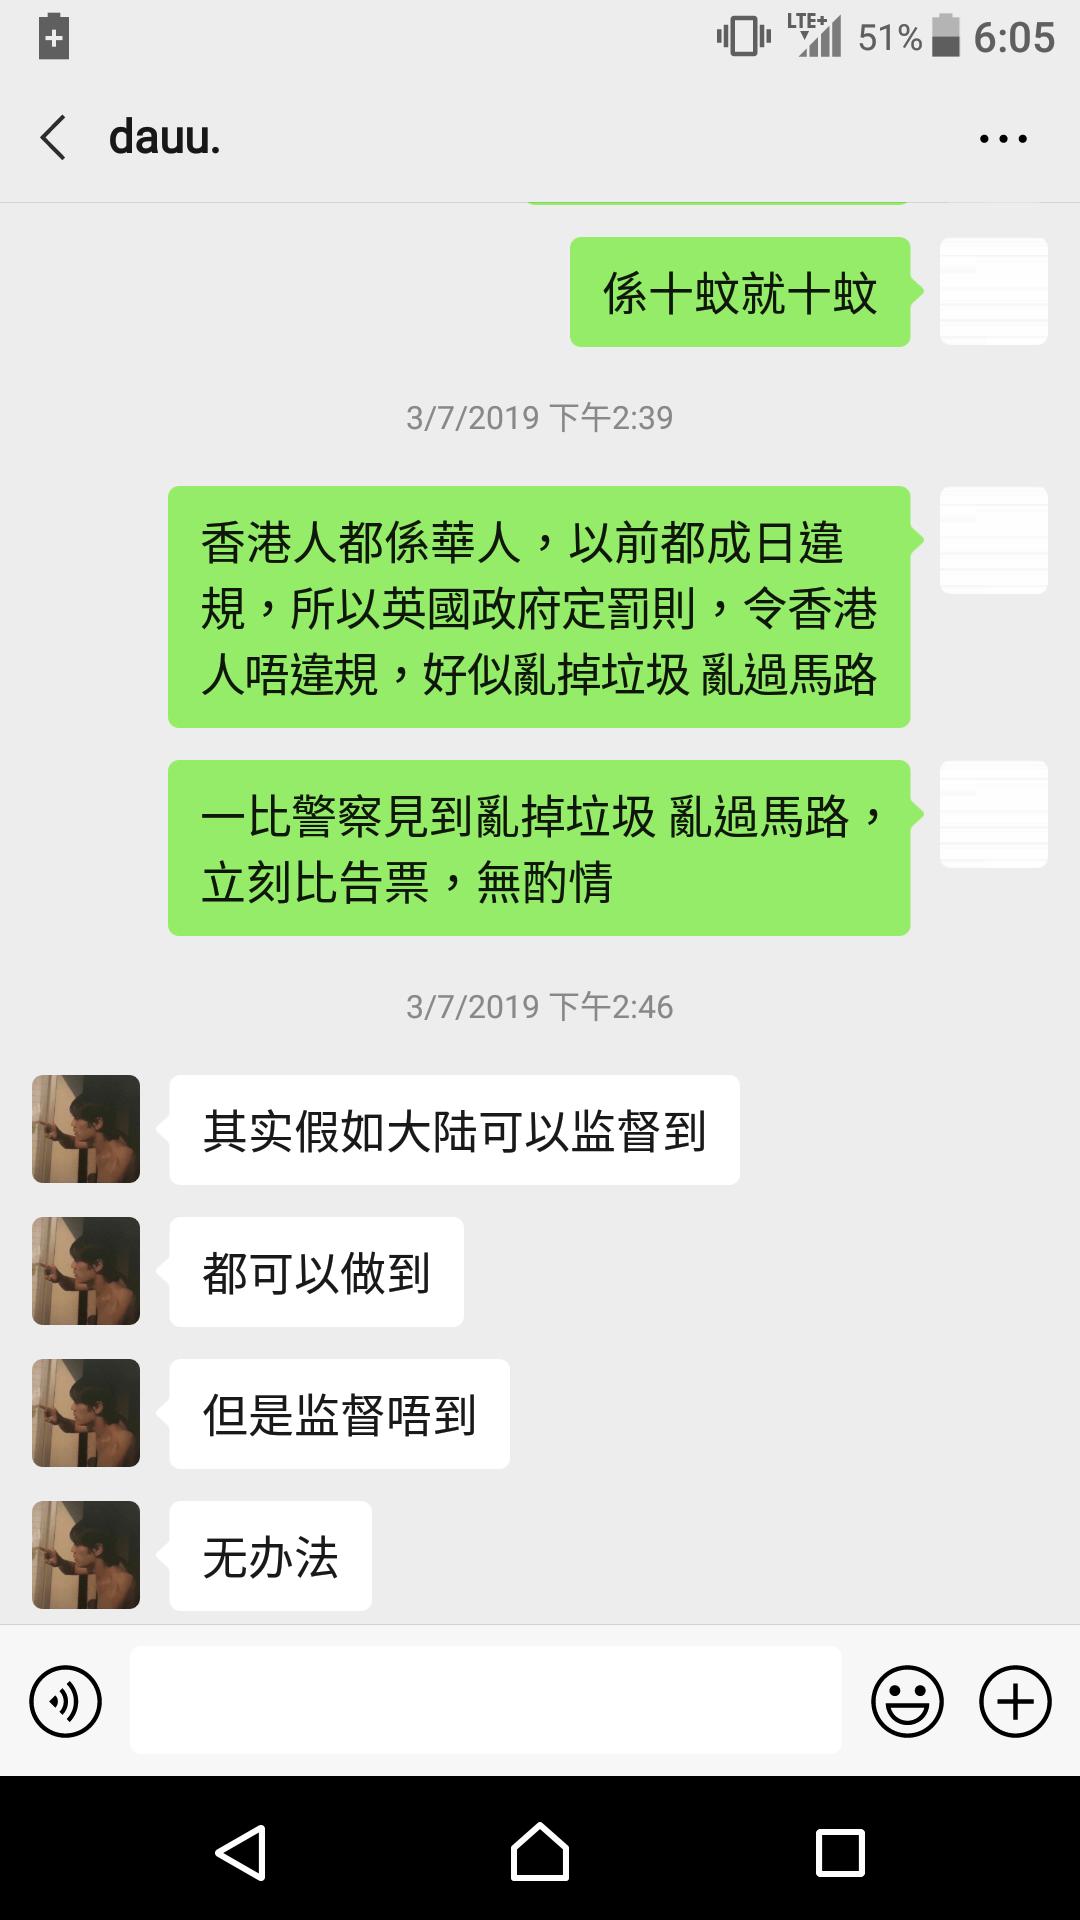 https://upload.hkgolden.media/comment/xzeenpao.xg4nhddvmdj.myu3pjy4oq0.jes.png